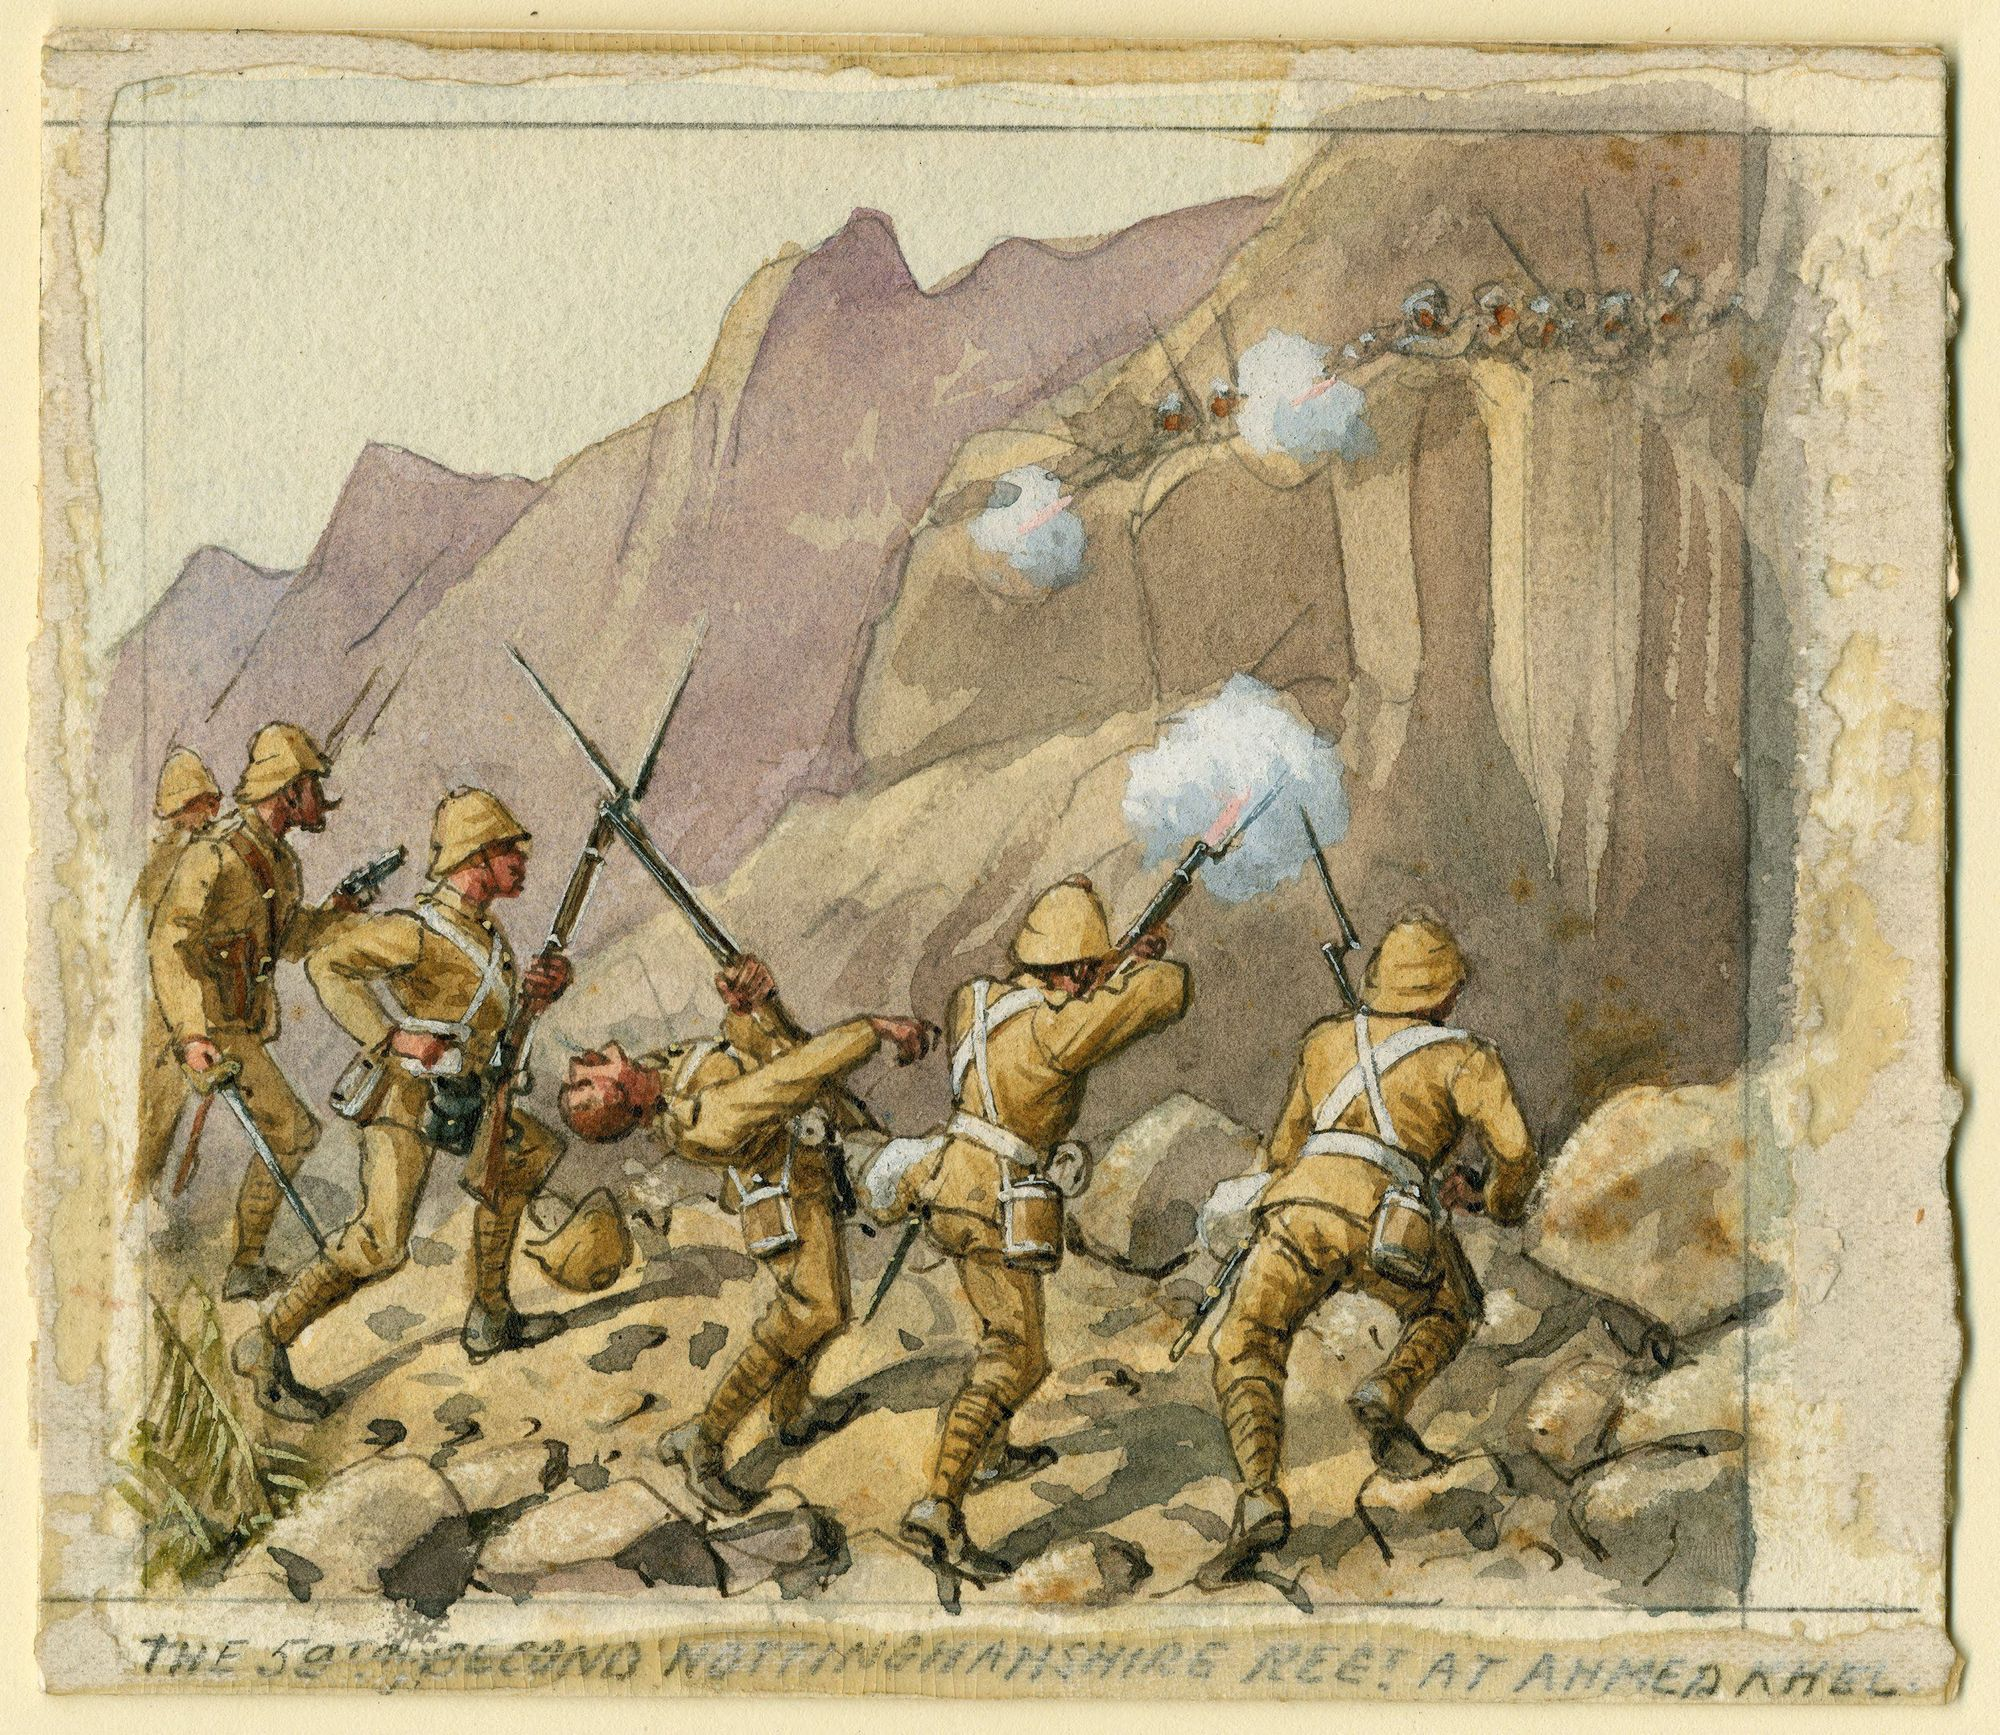 59th (2nd Nottinghamshire) Regiment of Foot at Ahmed Khel, 2nd Afghan War 1880 by Richard Simkin.